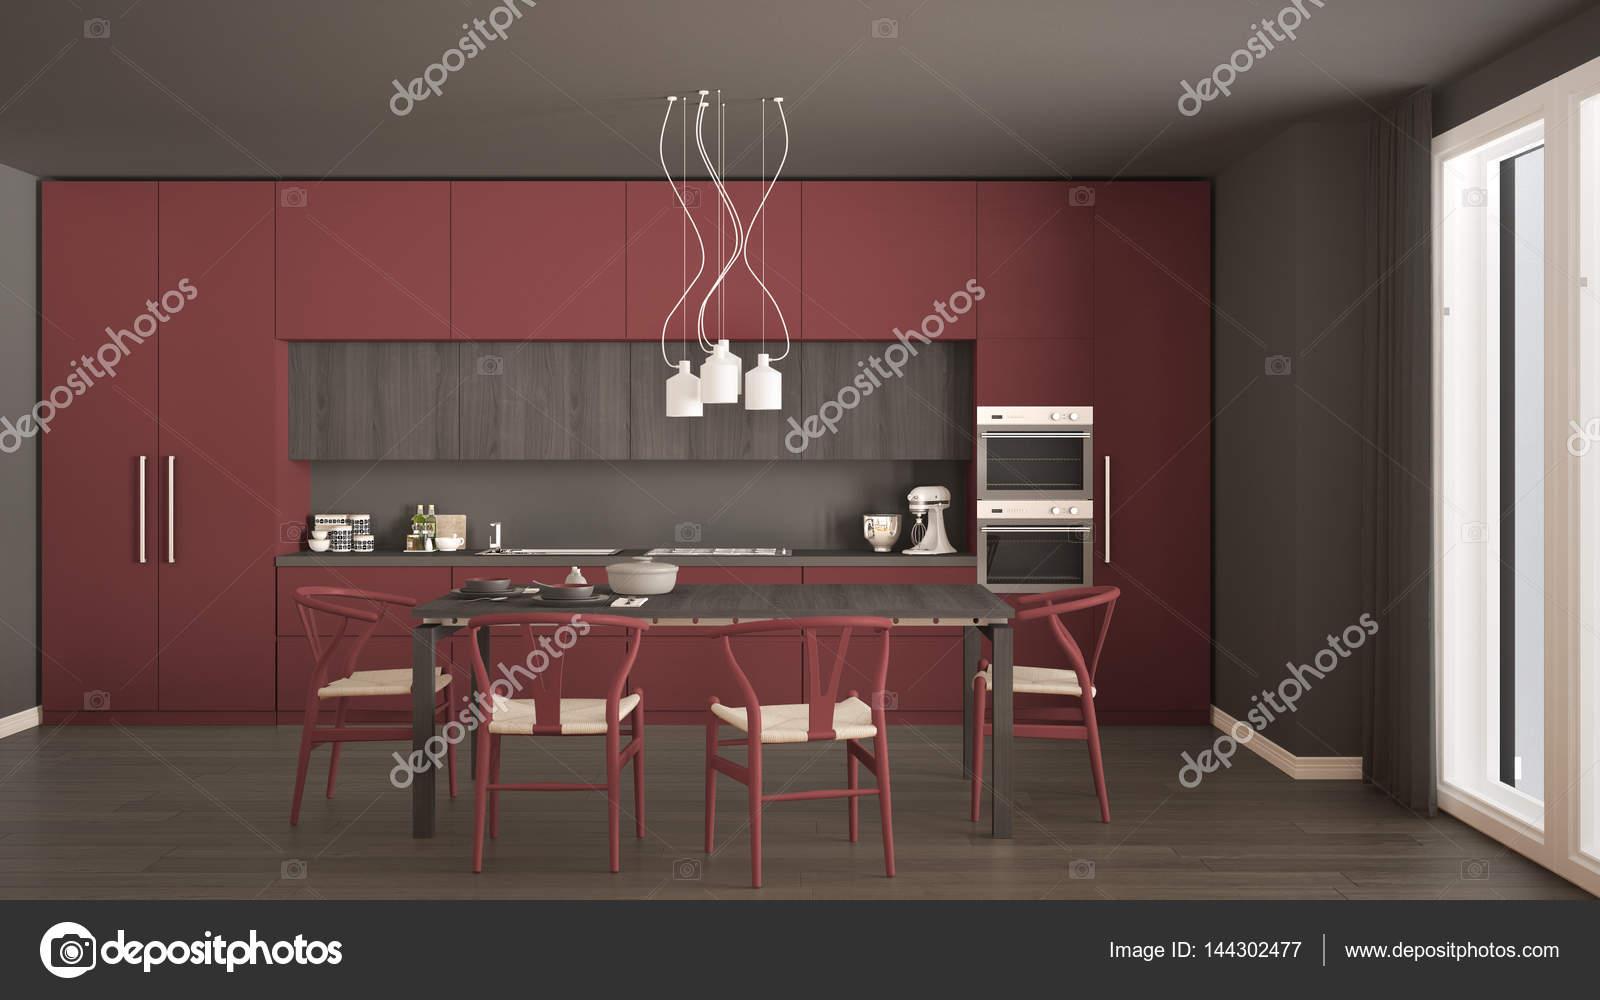 wood floors in kitchen cabinet ideas for kitchens 现代最小红色厨房用木地板 经典室内d 图库照片 c archiviz 144302477